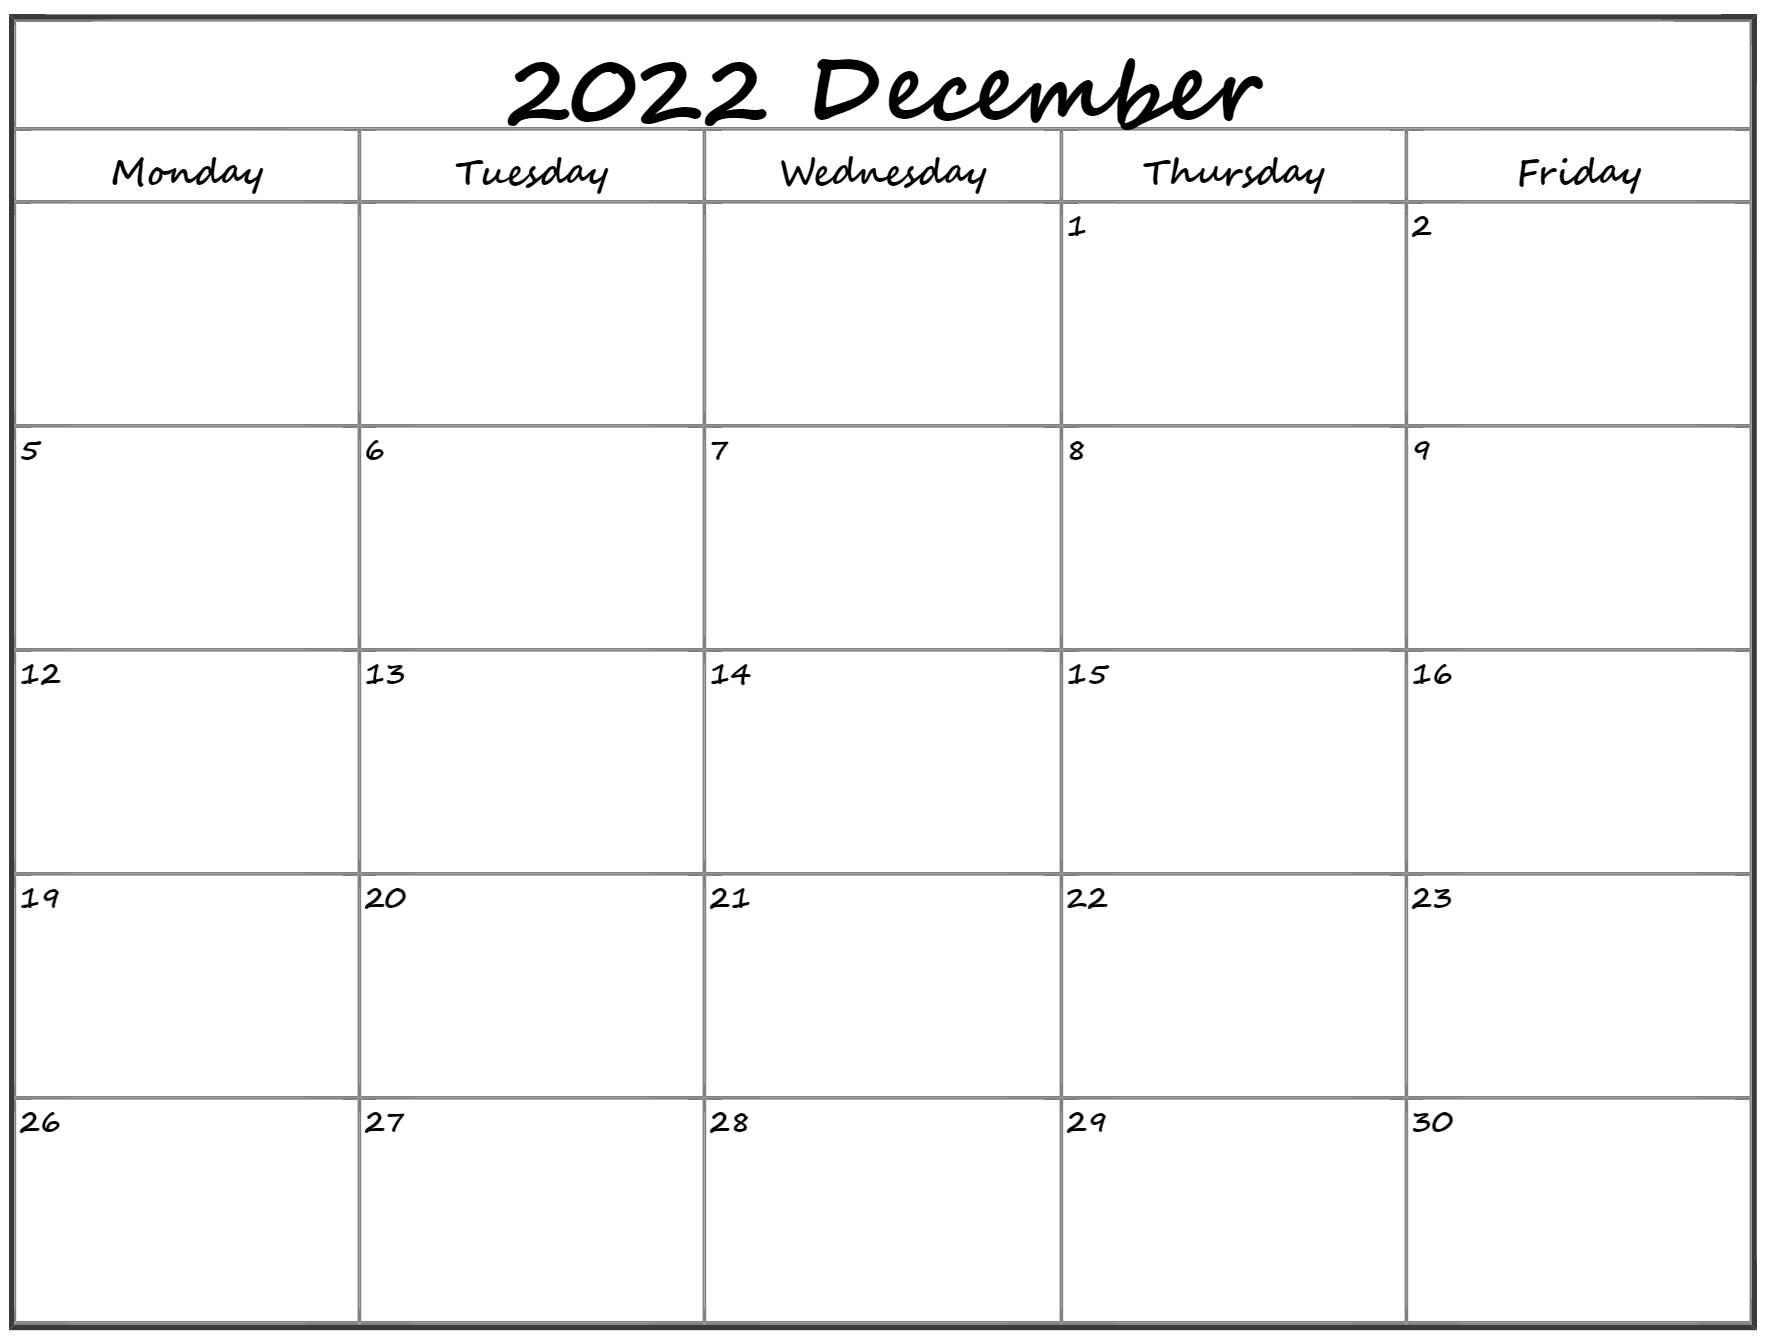 December 2022 Monday Calendar | Monday to Sunday